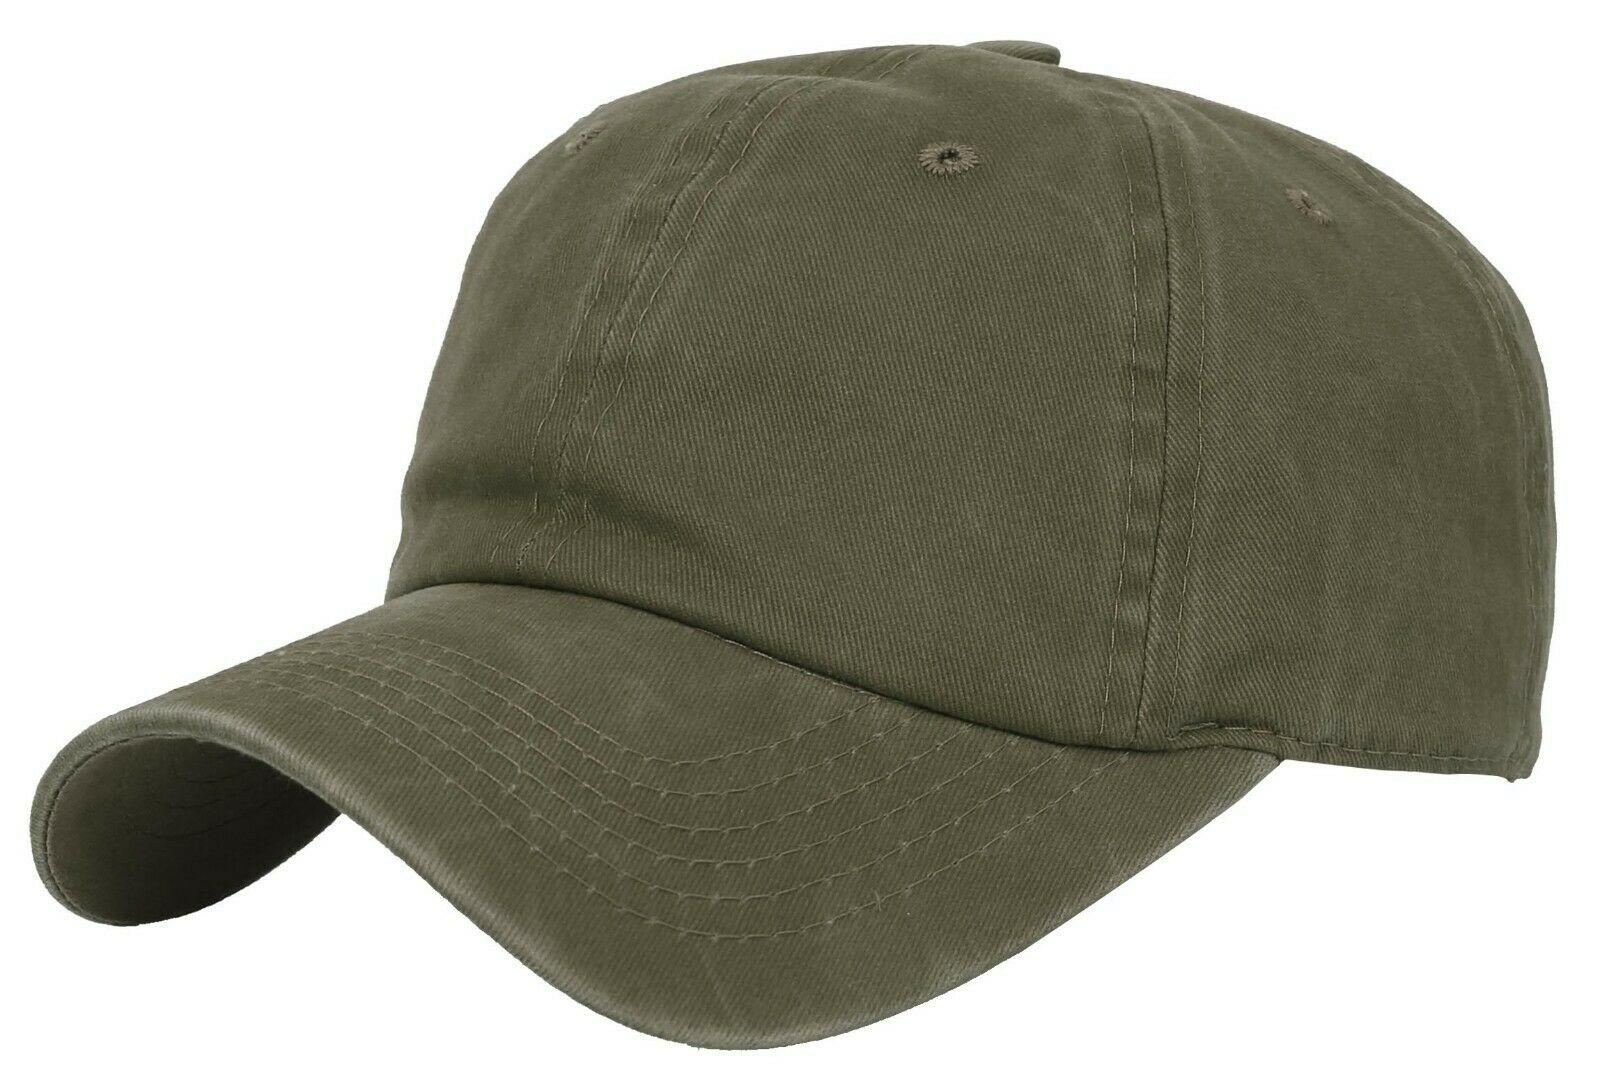 BASEBALL-CAP-Plain-Dad-Hat-Low-Profile-Vintage-Washed-Pigment-Adjustable thumbnail 8